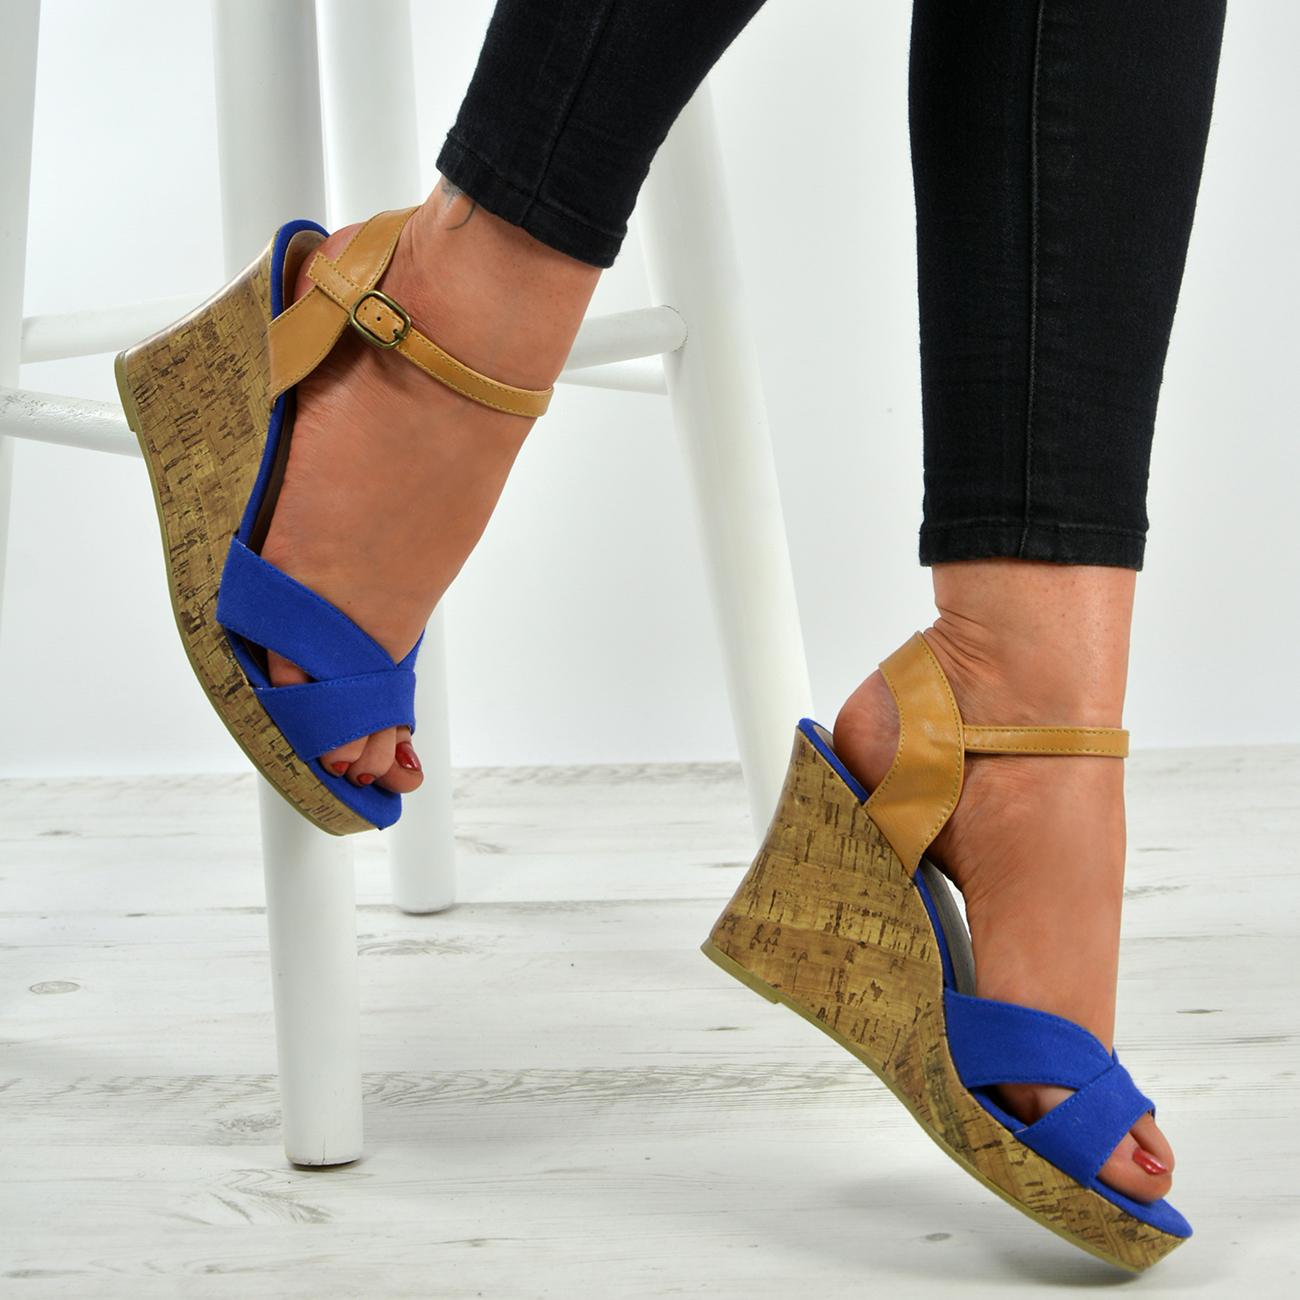 New-Womens-Ladies-Ankle-Strap-Espadrille-Wedge-Heel-Platform-Sandals-Shoes